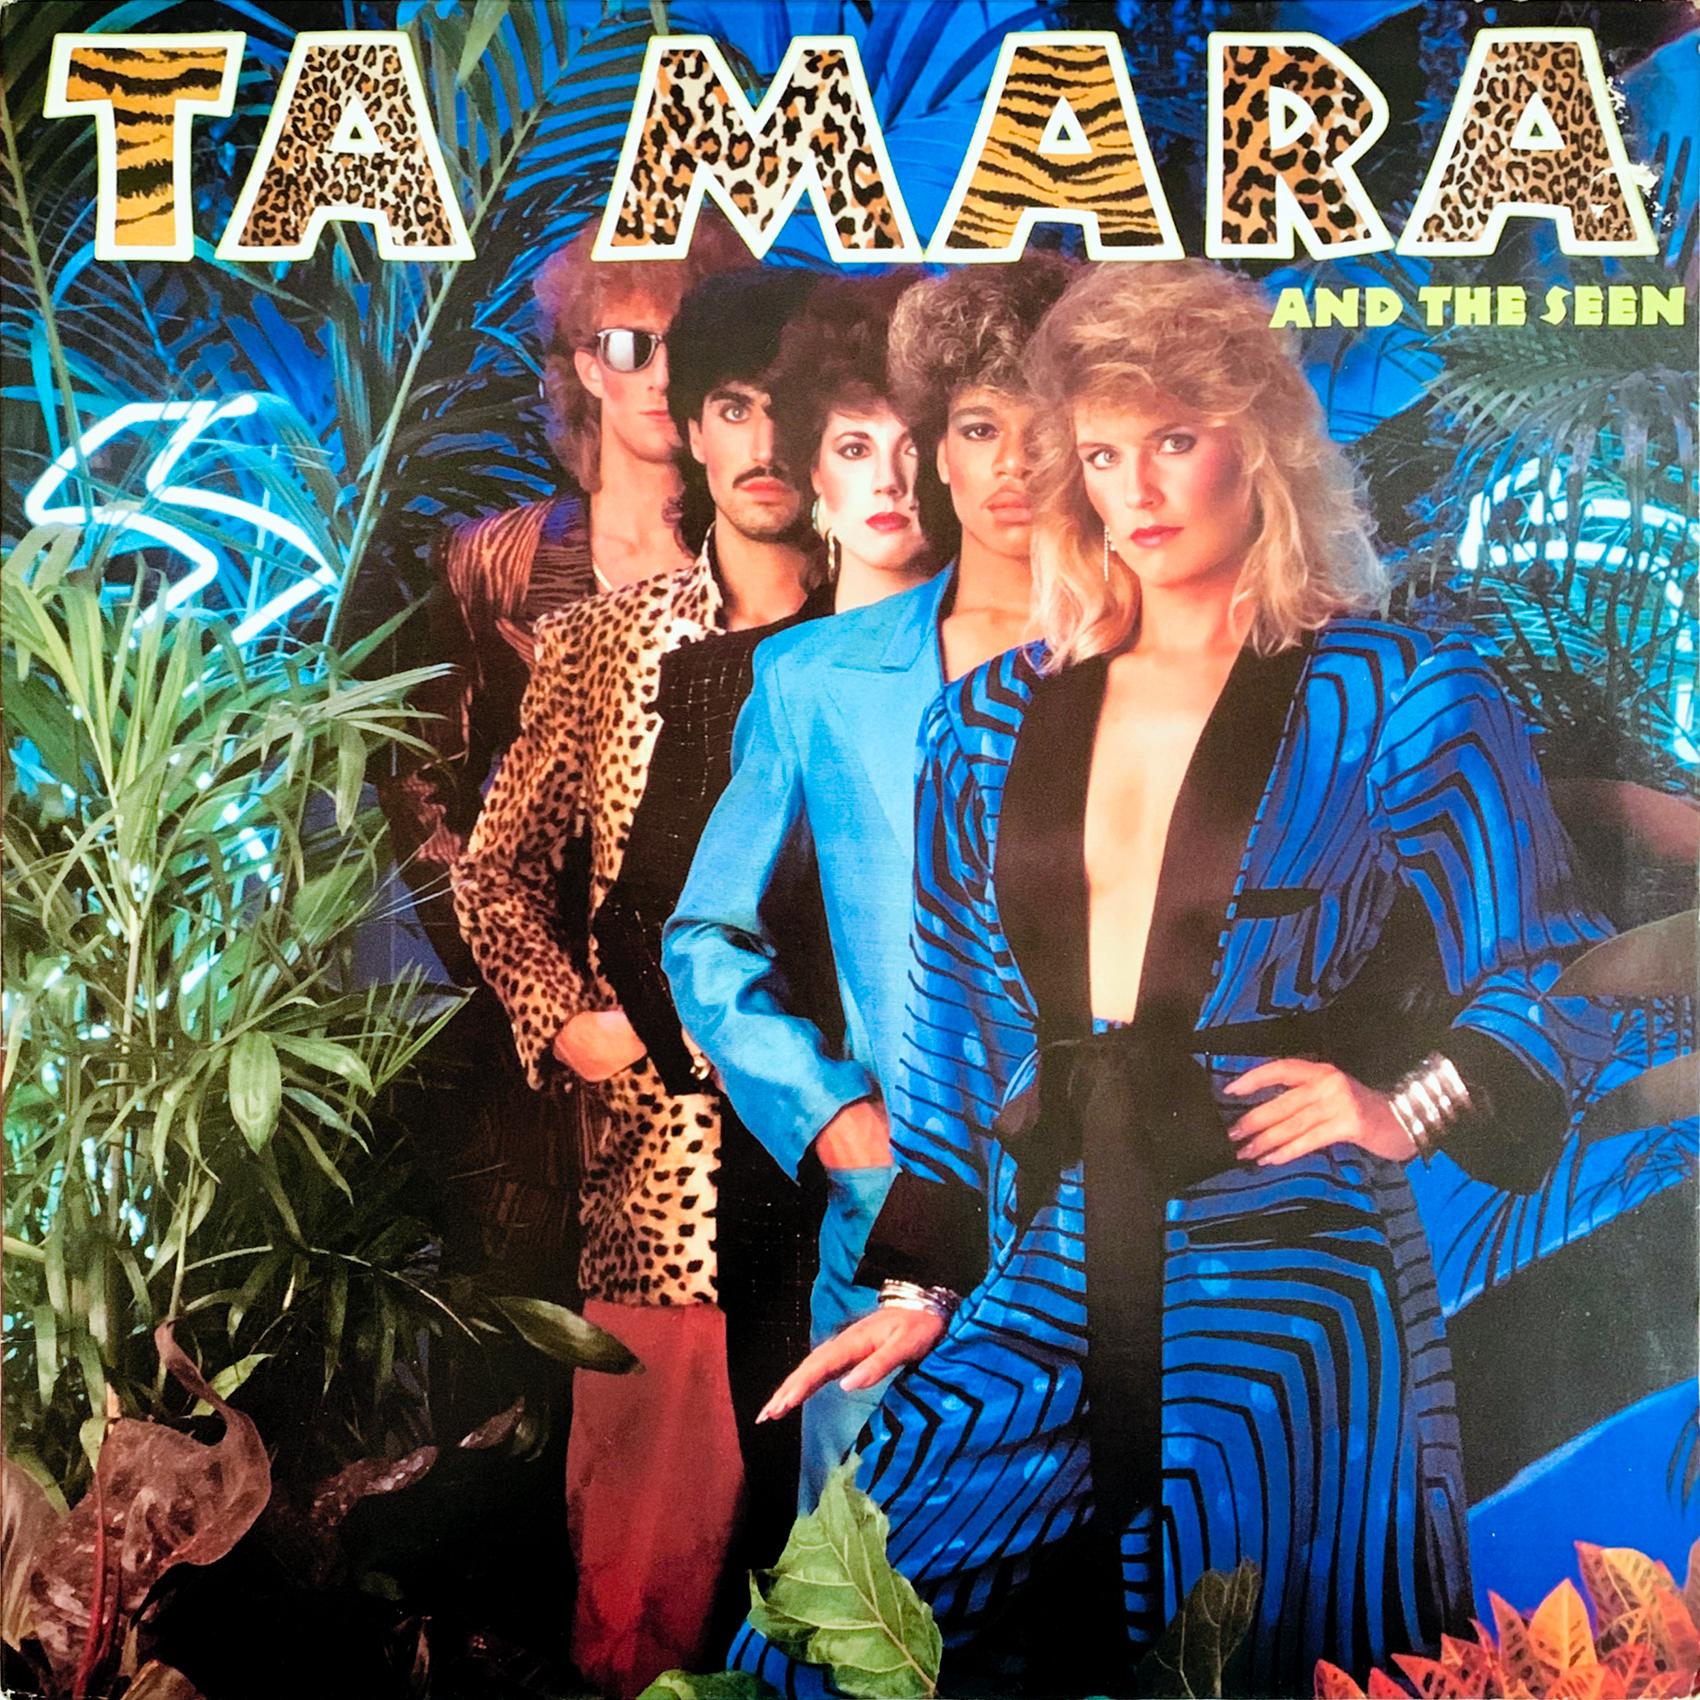 Ta Mara and the Seen - S/T